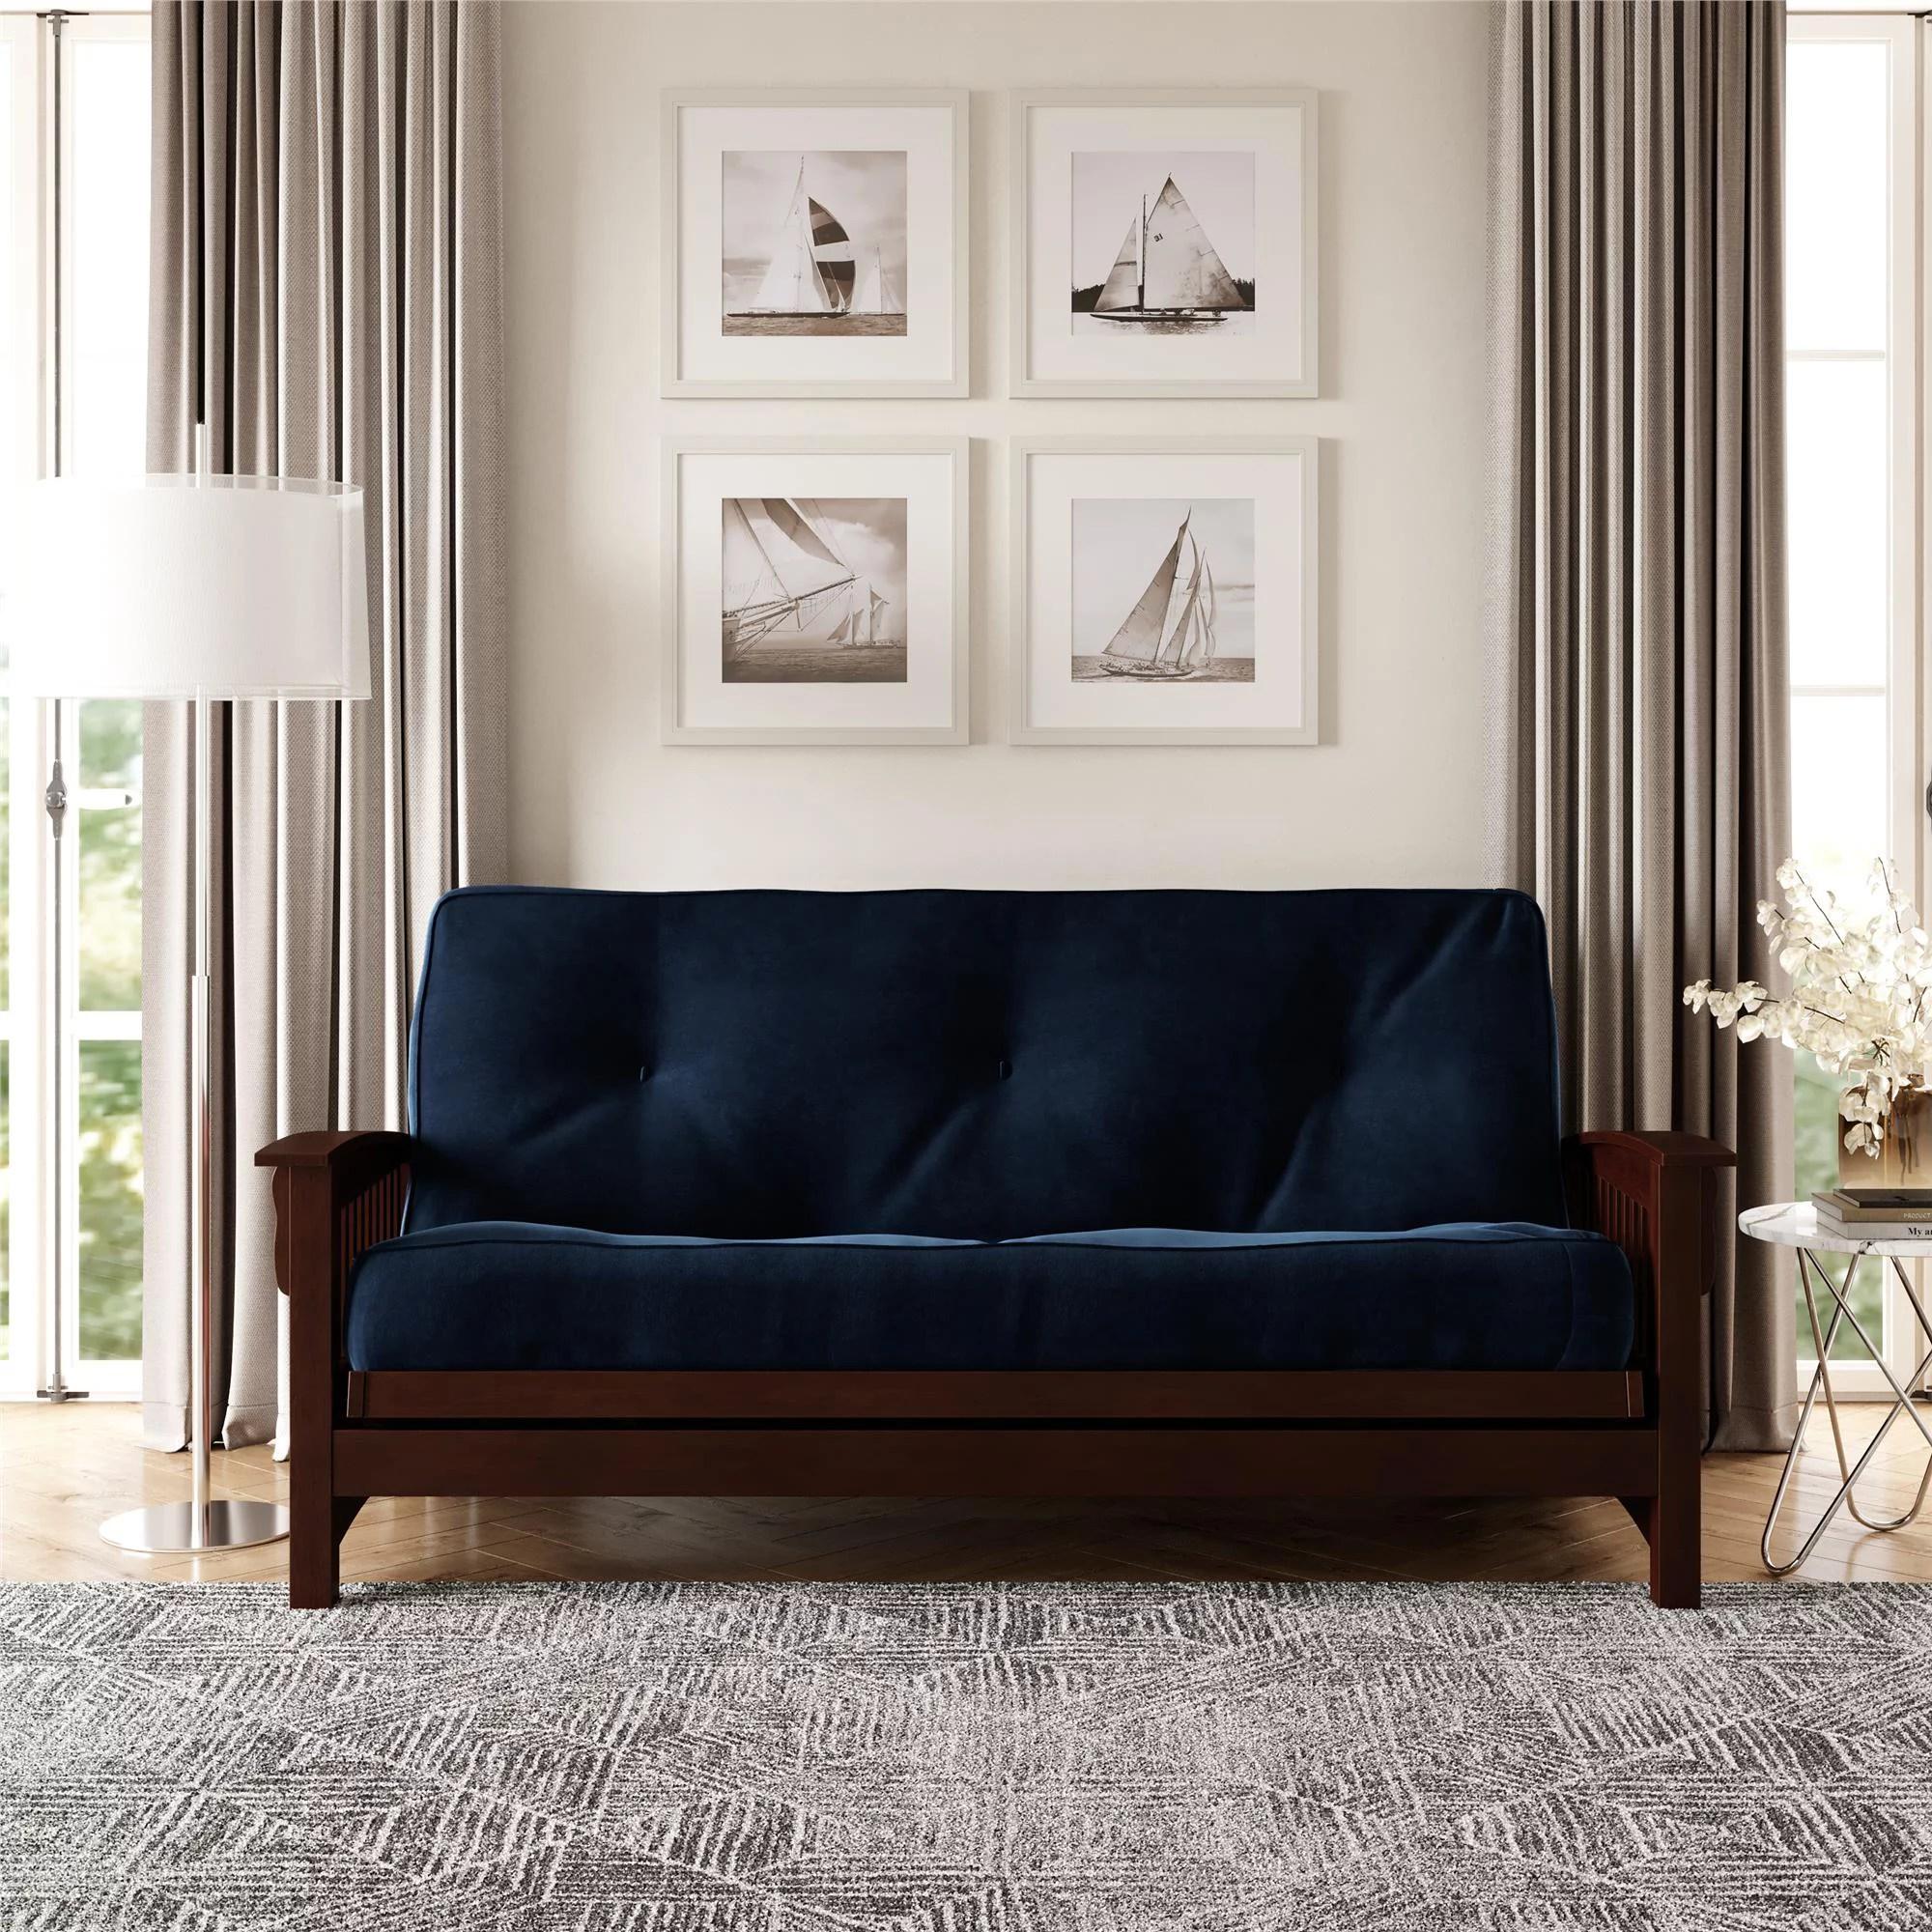 dhp 8 inch independently encased coil futon mattress blue microfiber walmart com